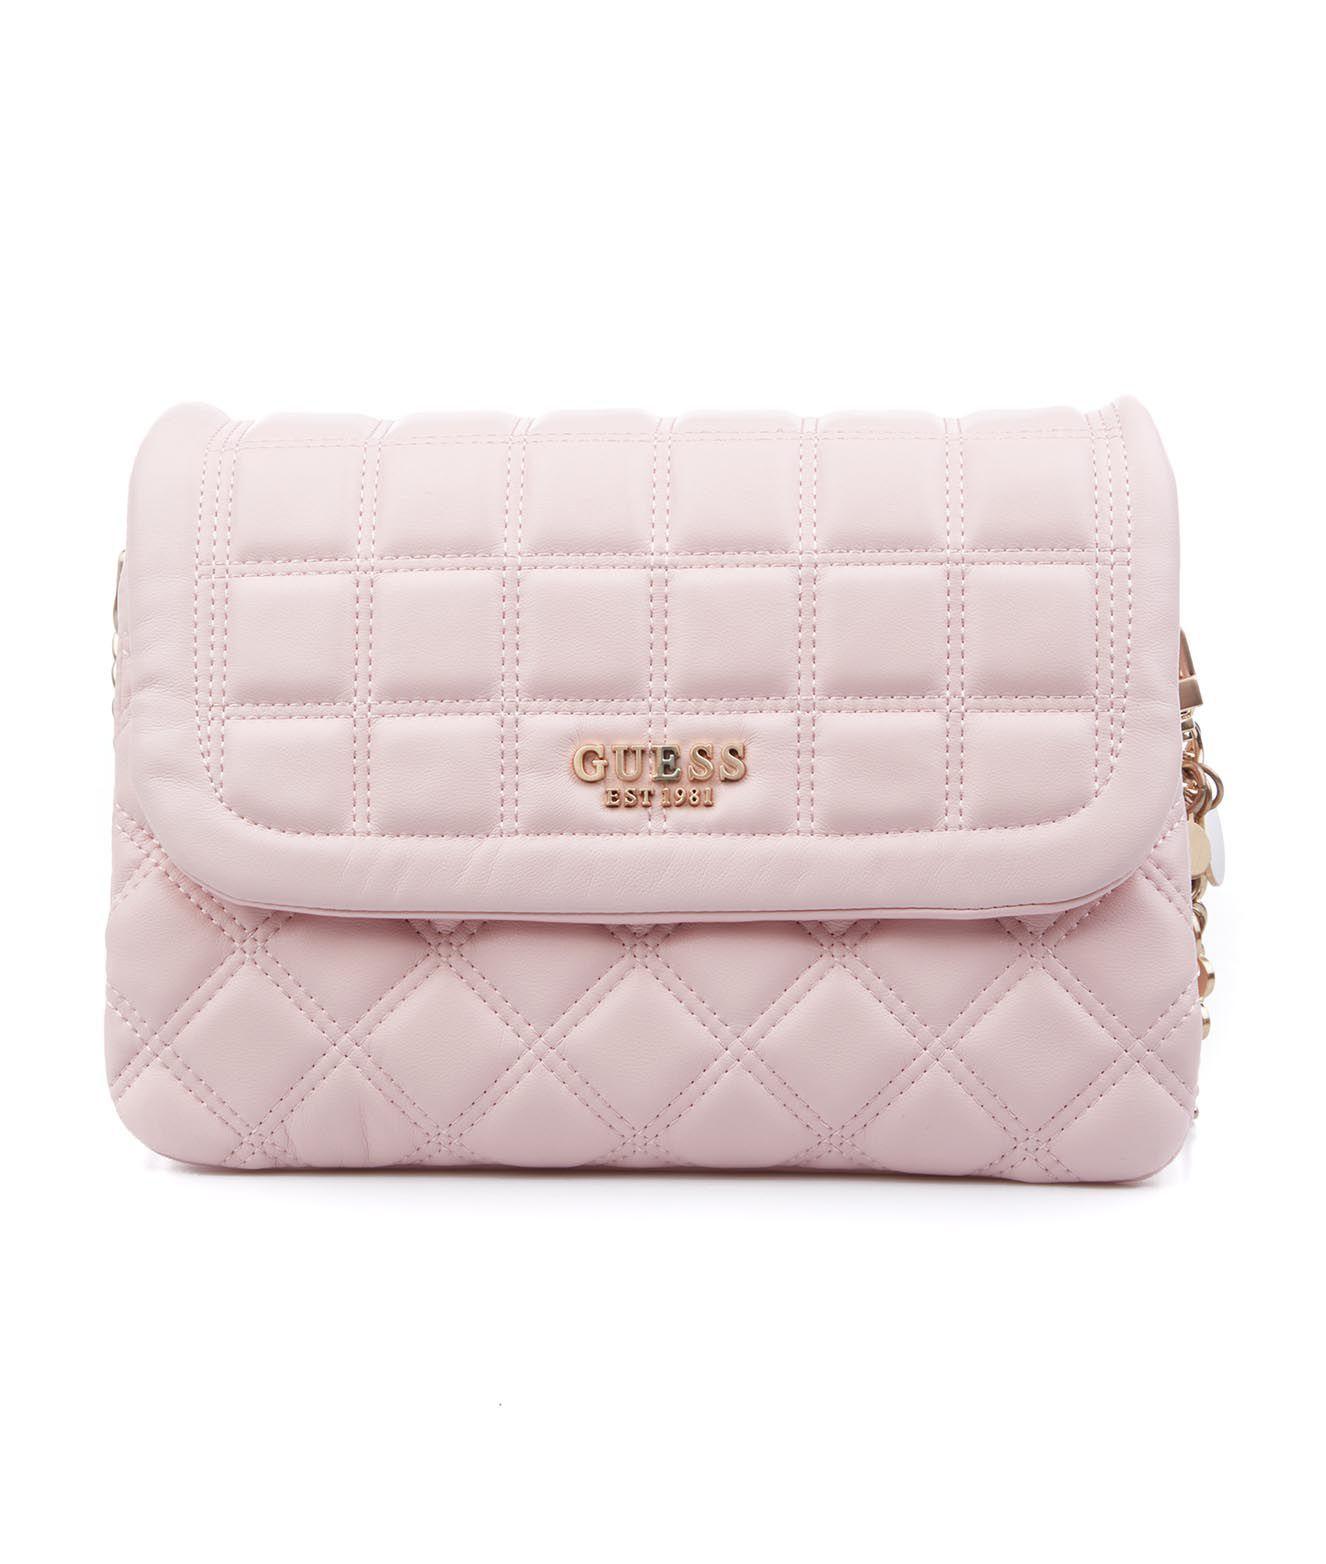 Guess GUESS WOMEN'S PINK OTHER MATERIALS SHOULDER BAG